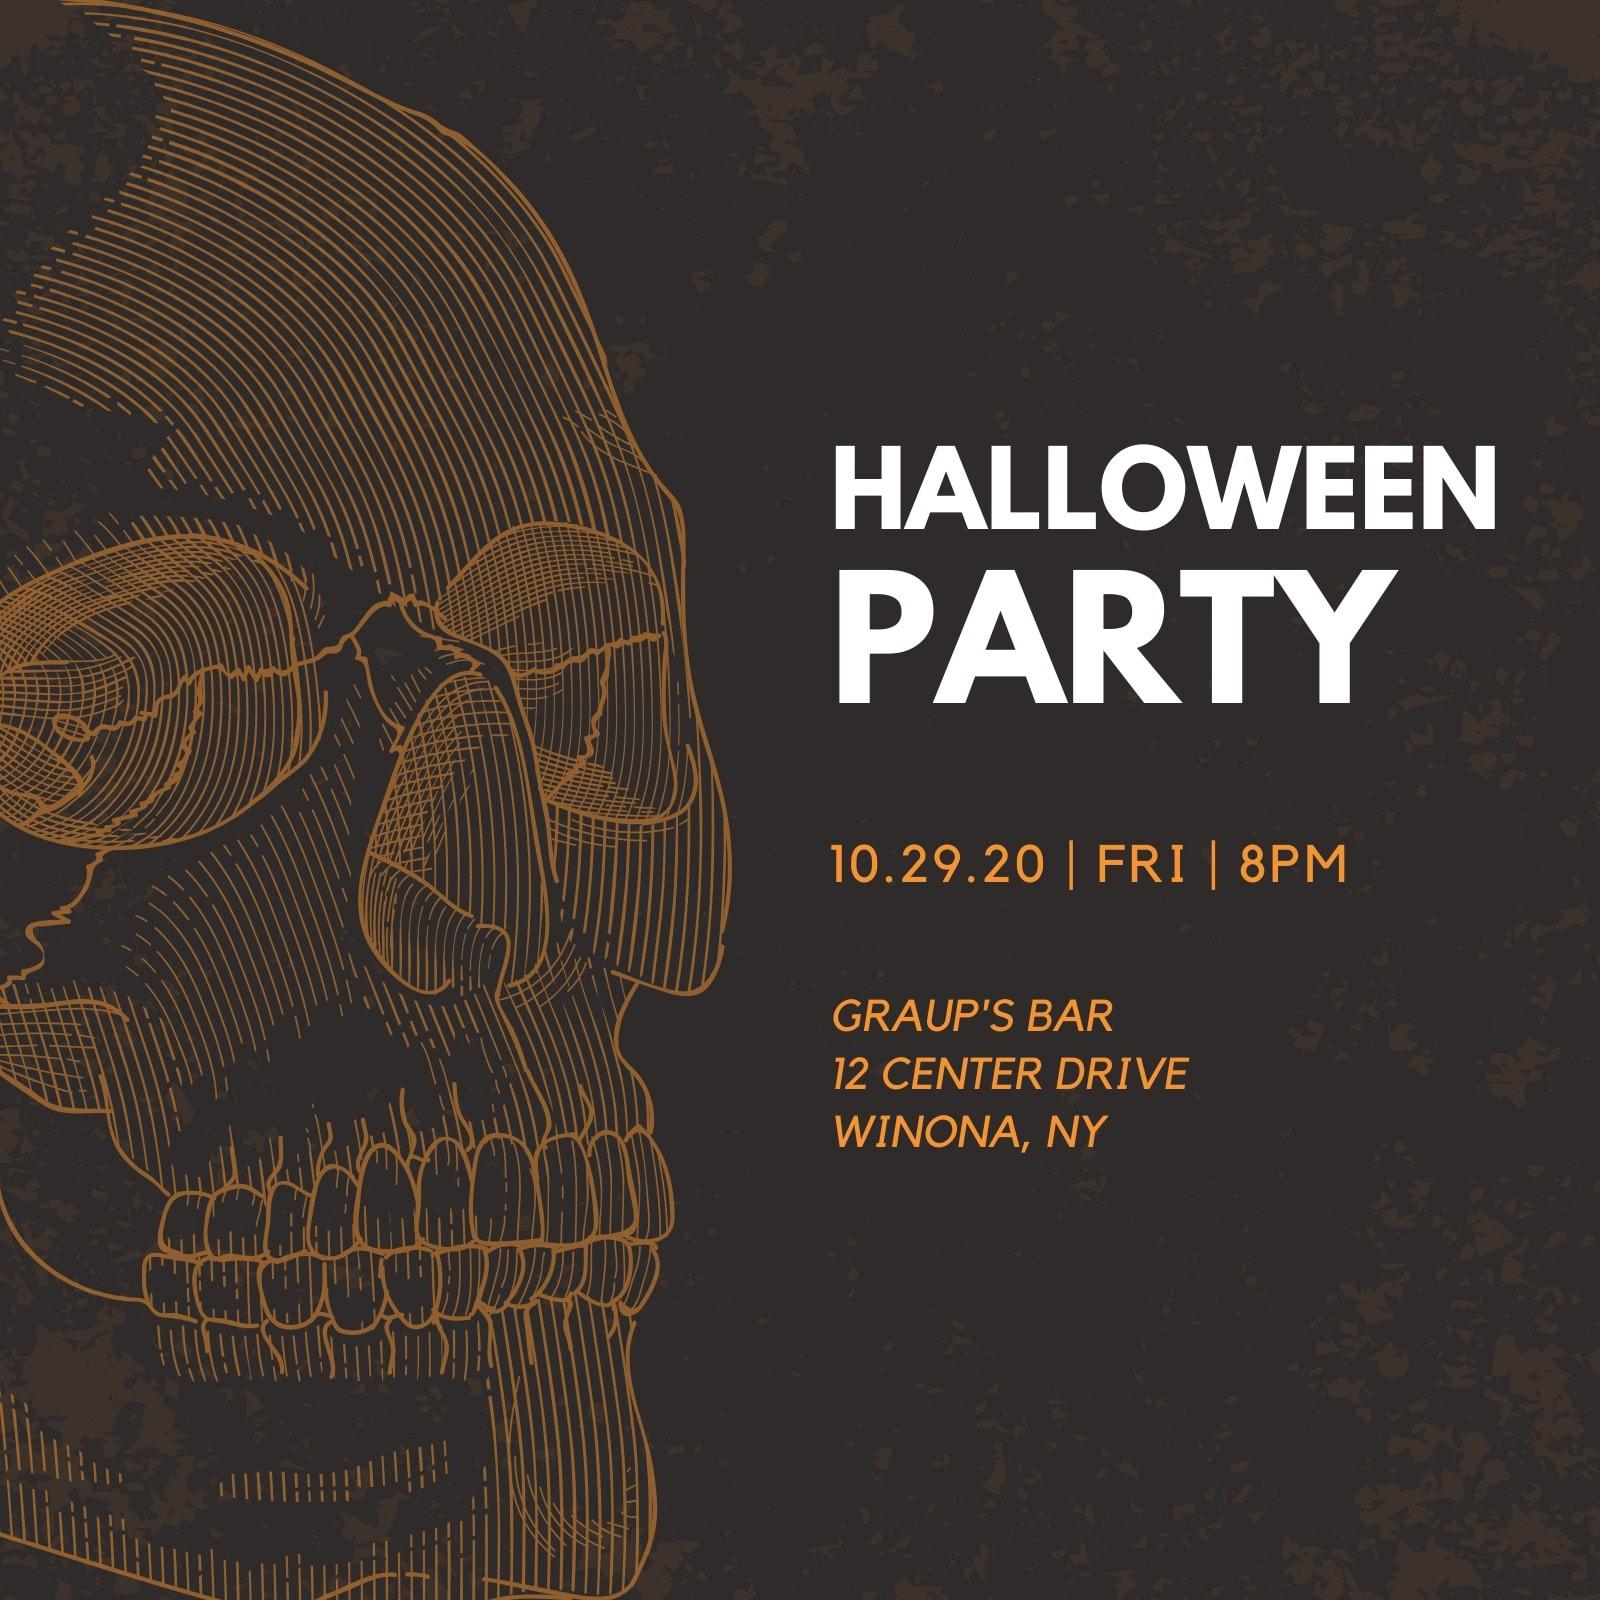 Orange and Black Illustrated Skull Halloween Party Invitation